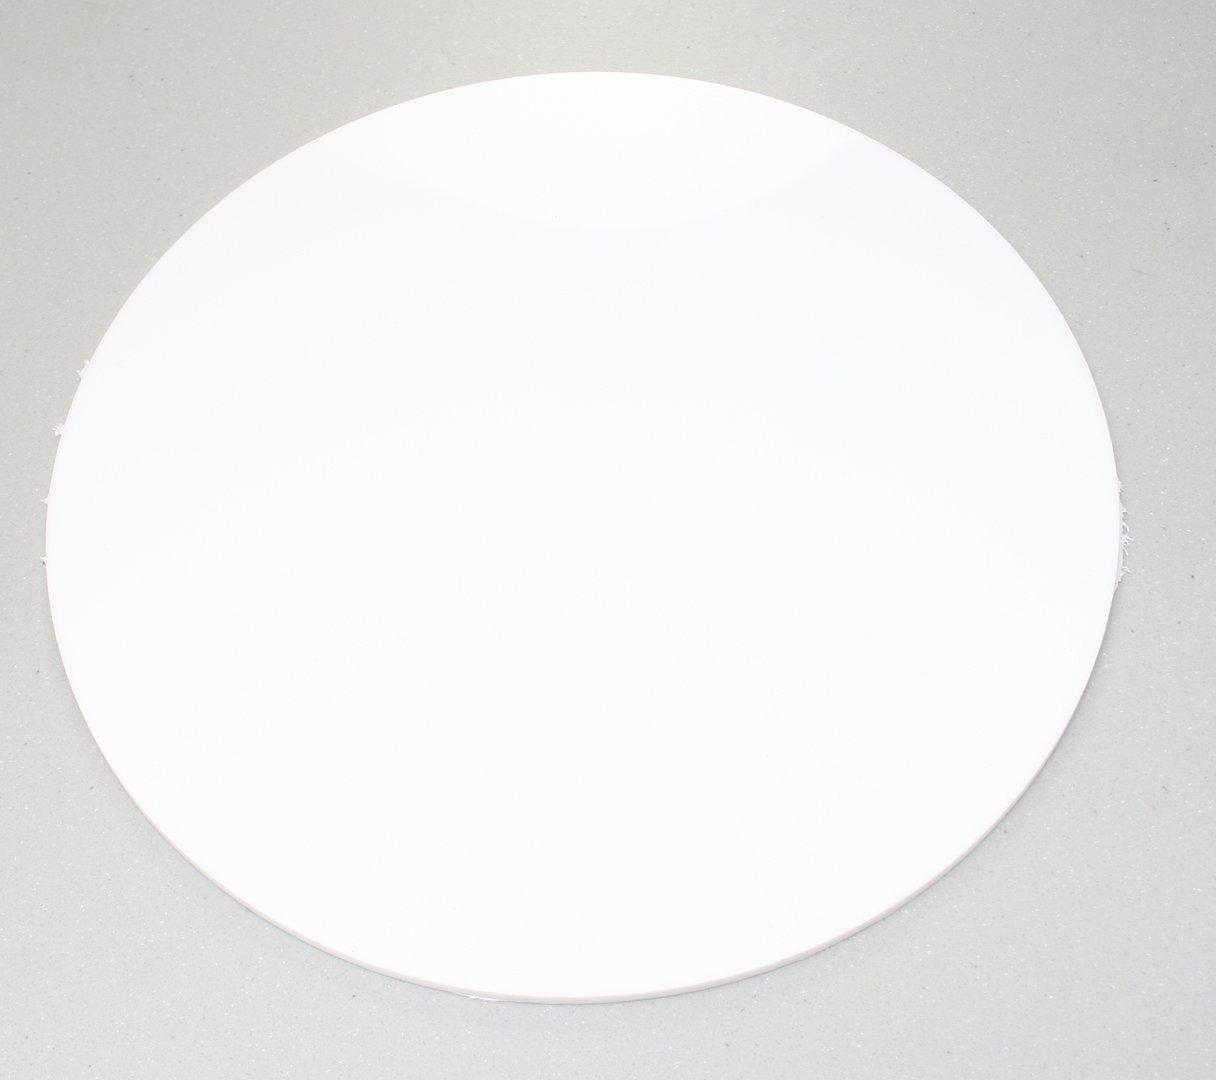 White Acrylic Disc Circles Southern Acrylics